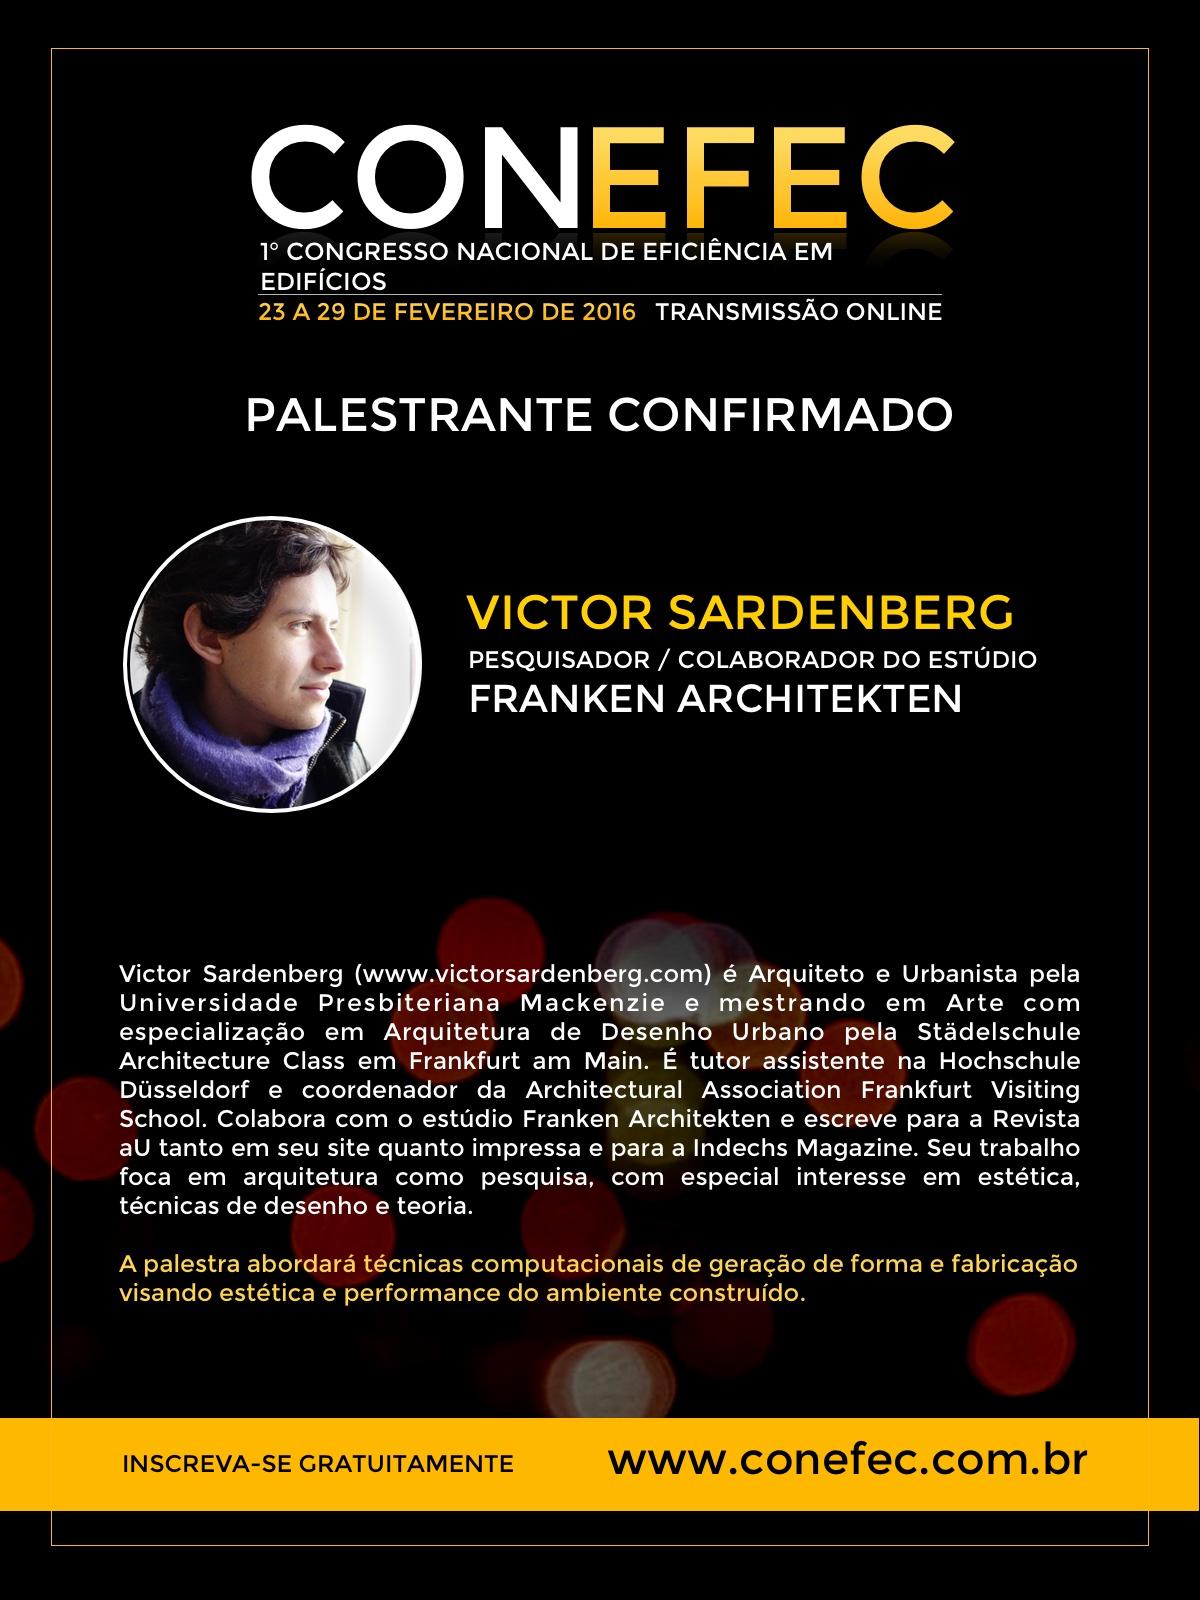 Victor Sardenberg.jpg